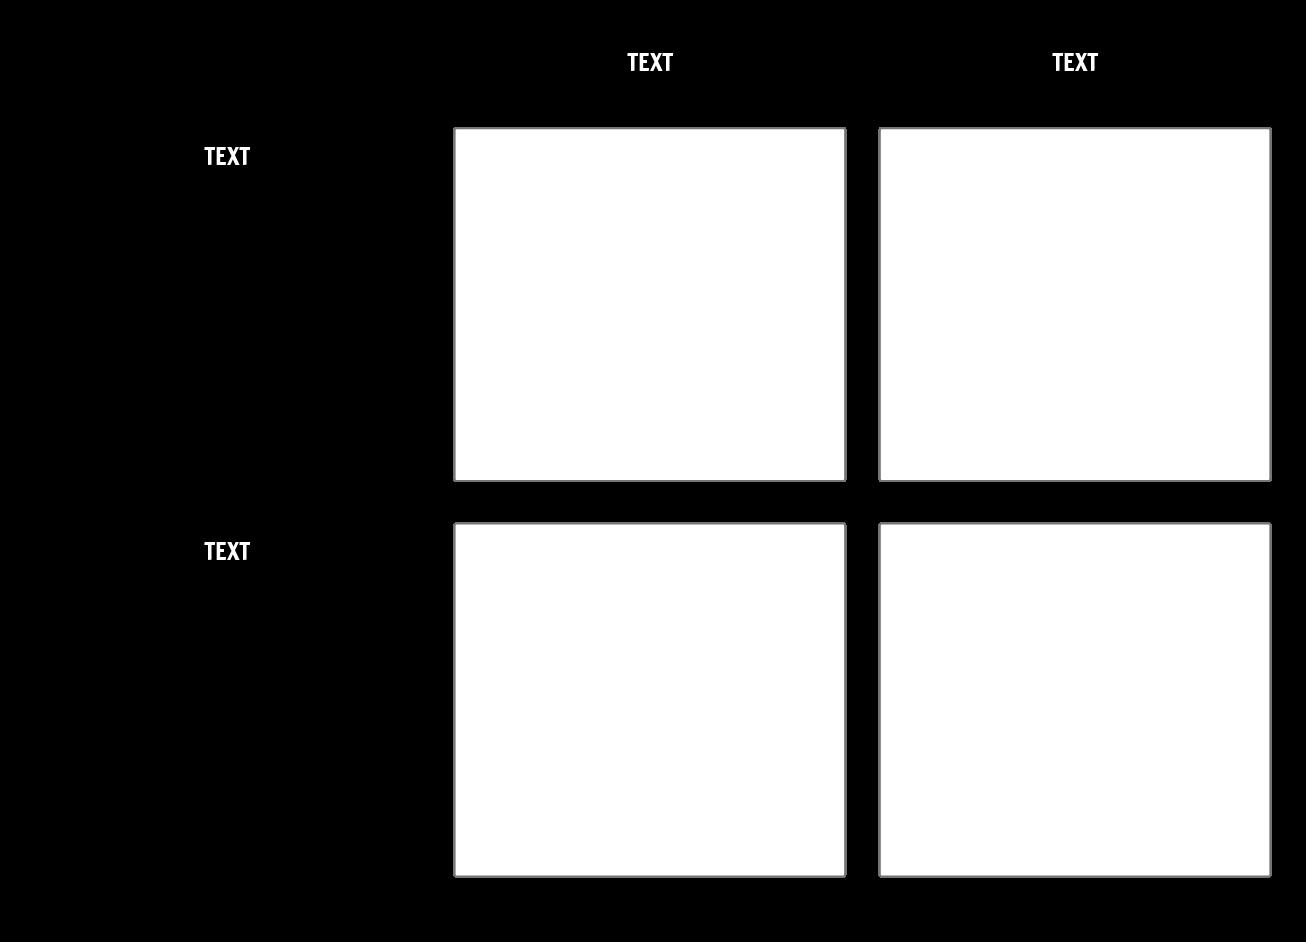 2x2 Grid